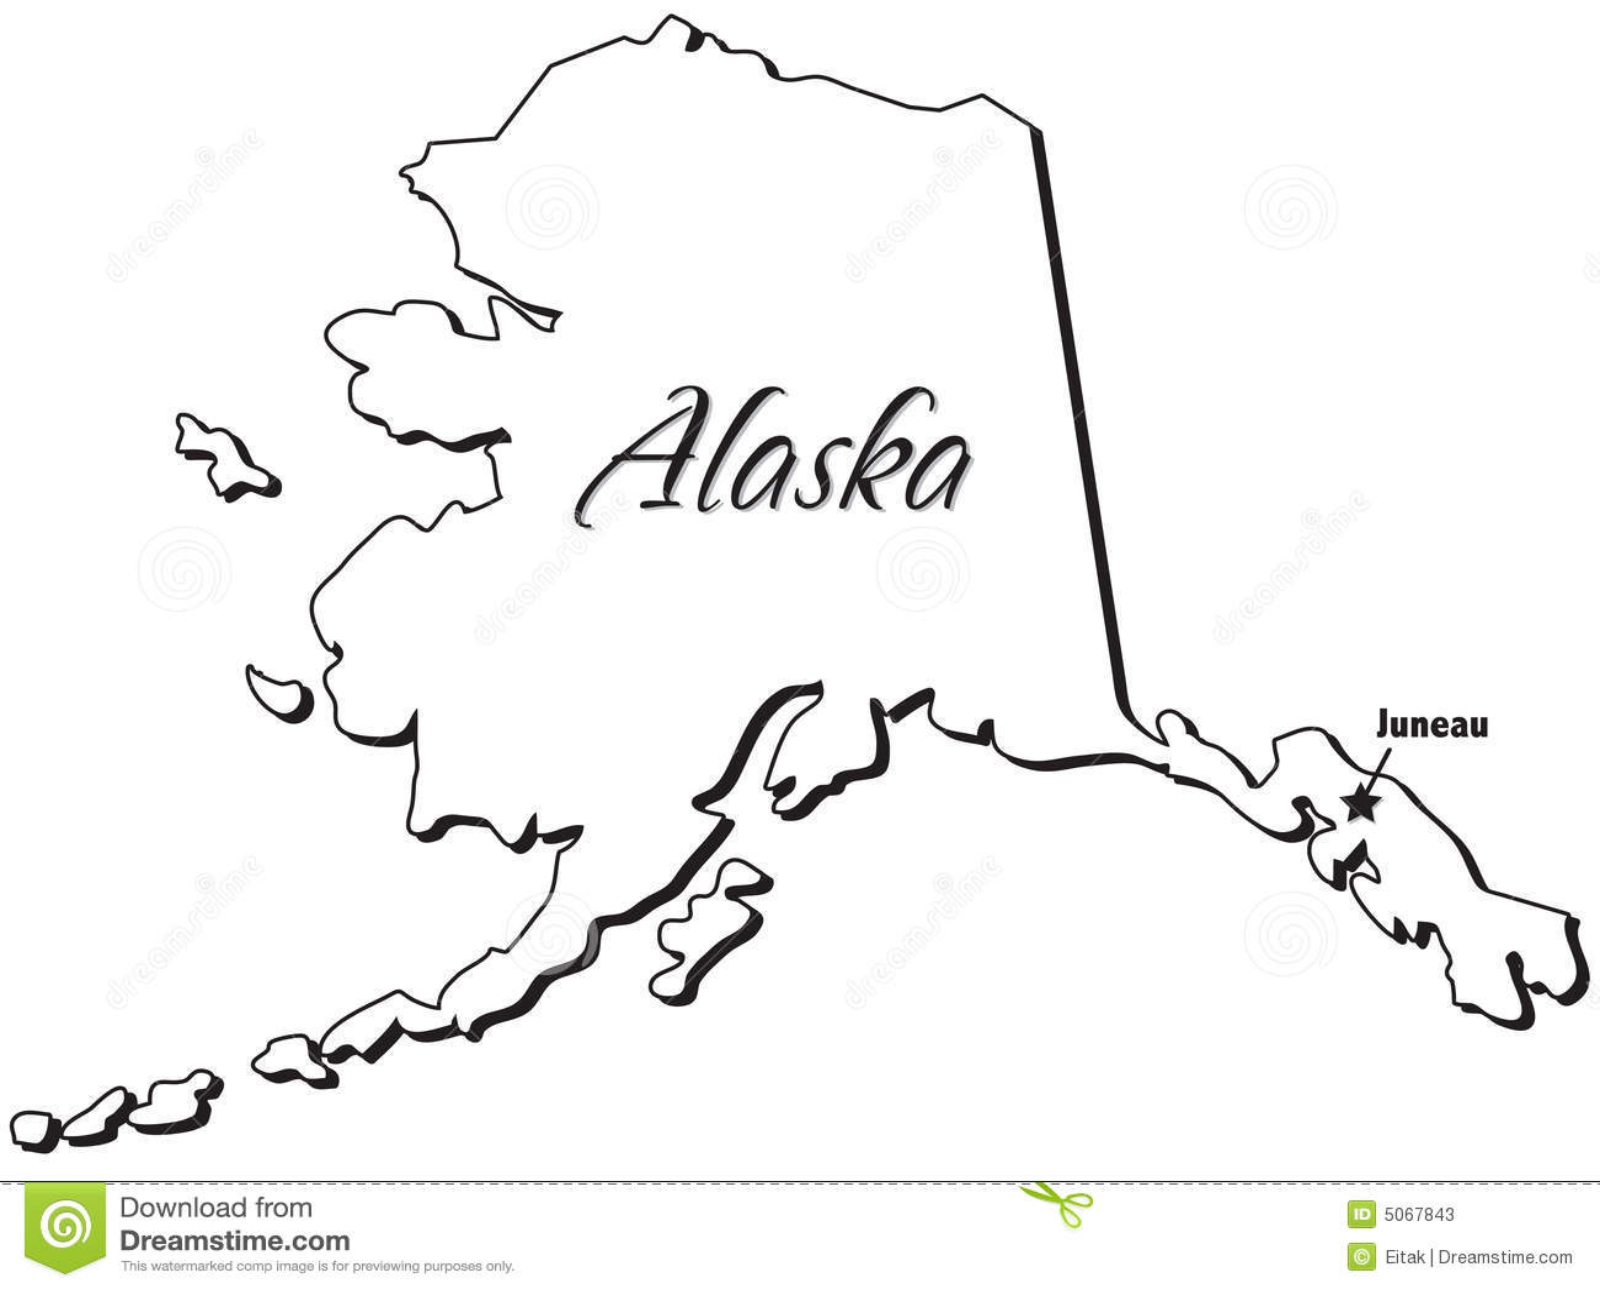 State Of Alaska Outline Stock Vector Illustration Of